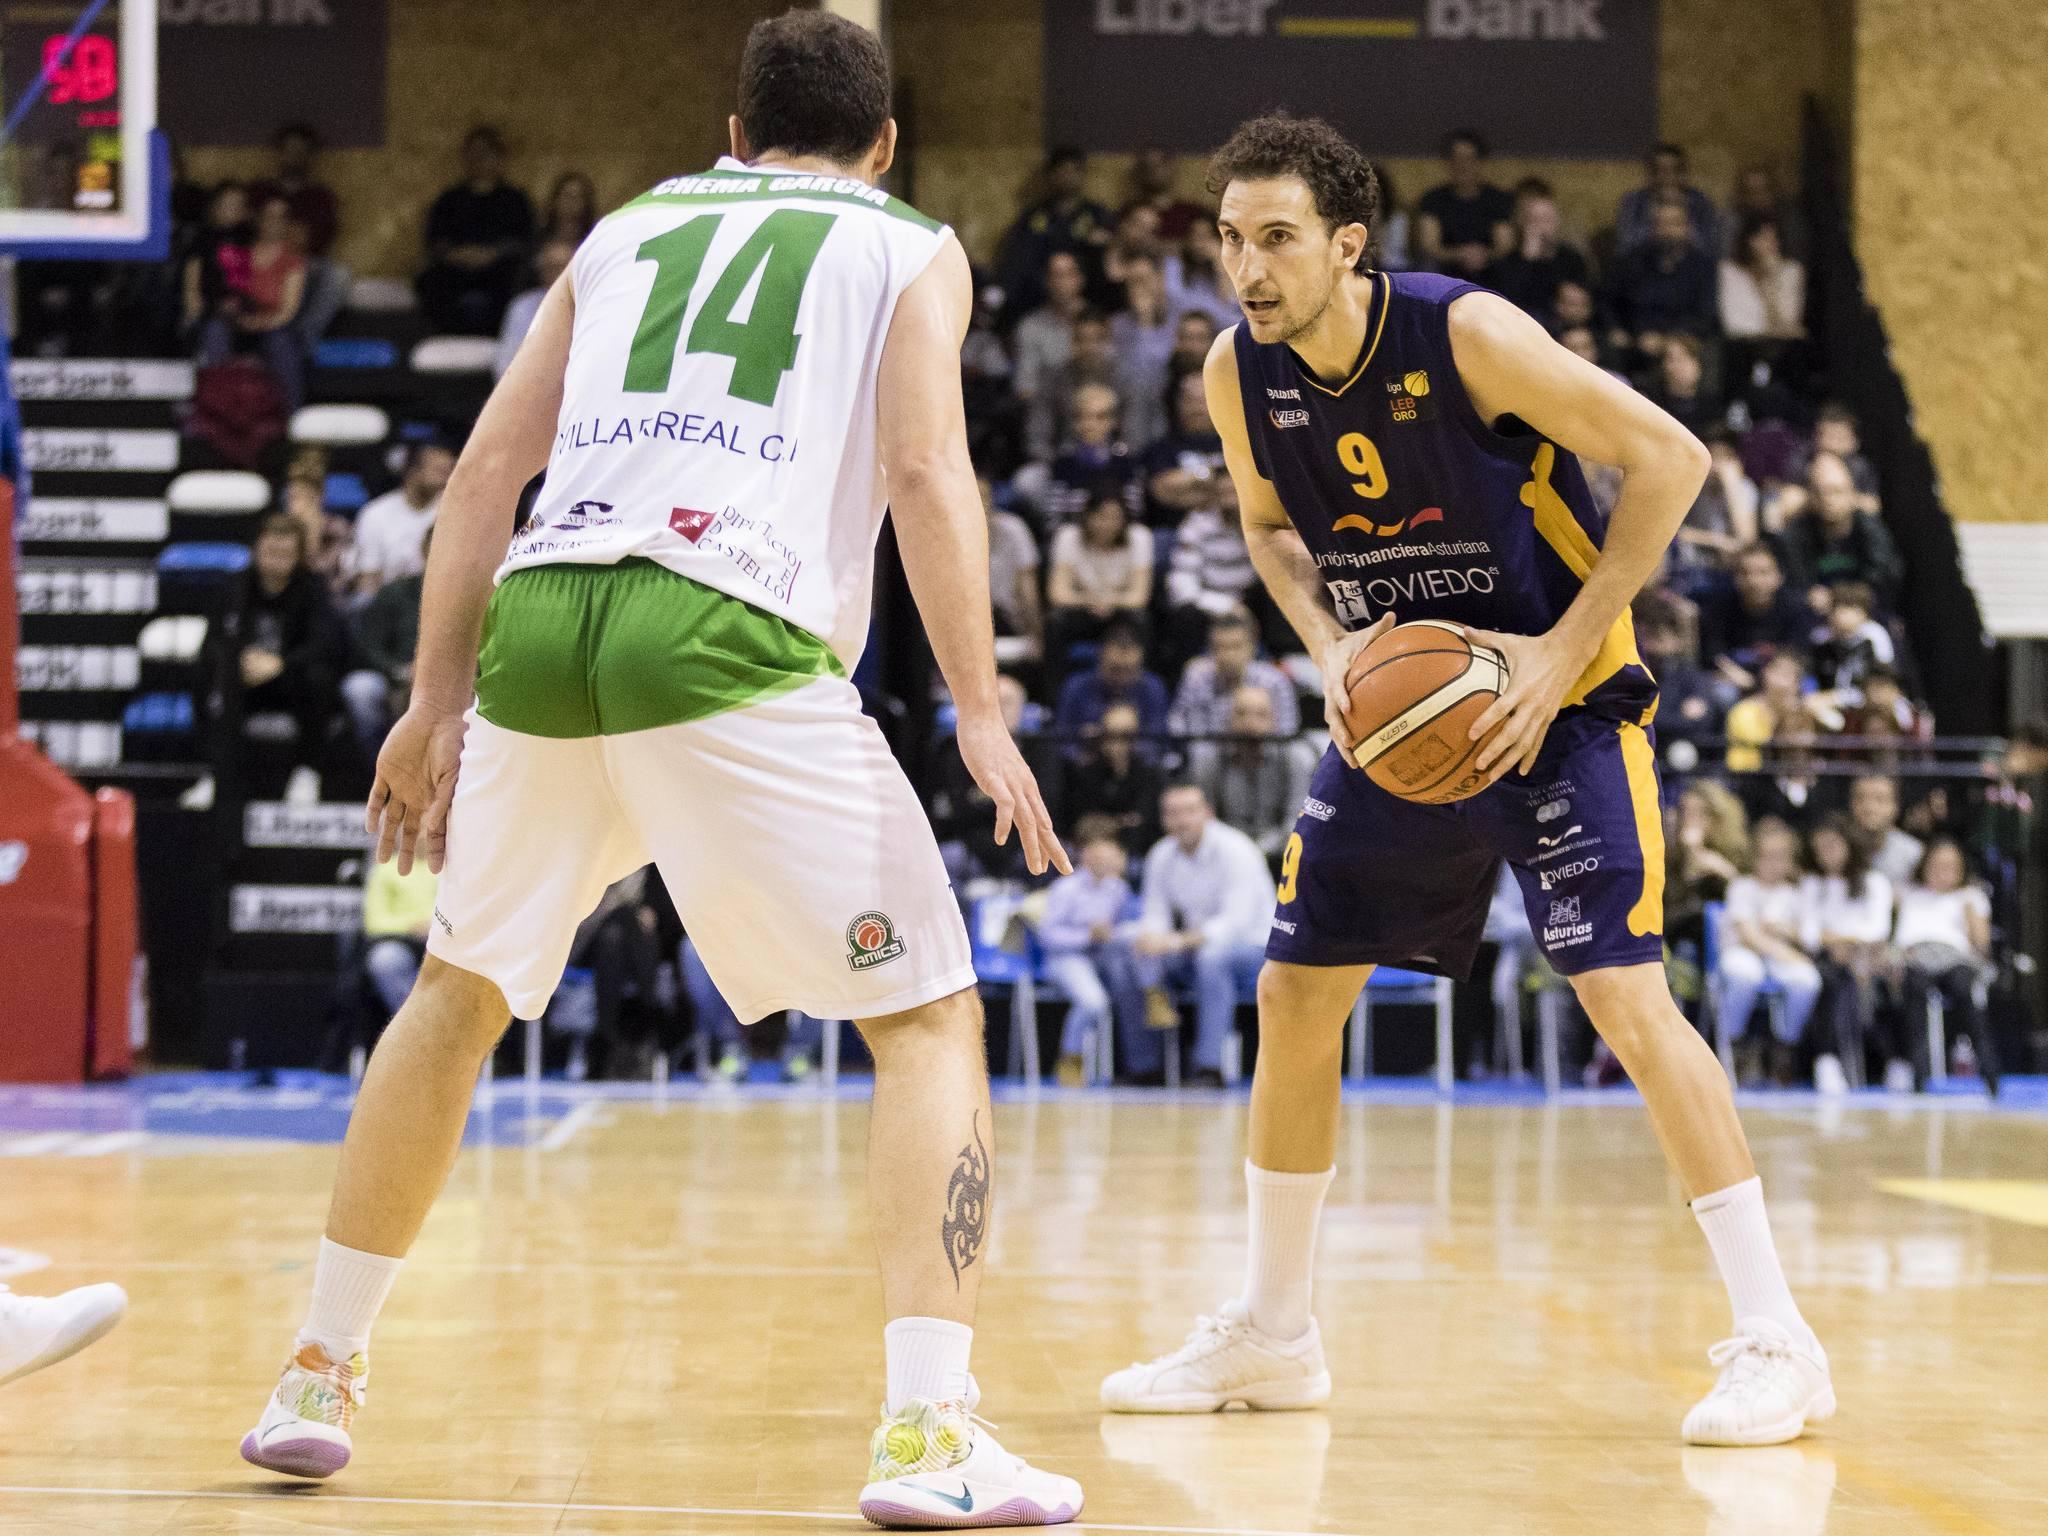 Víctor Pérez defendido por Jose María García (Foto: Christian García)